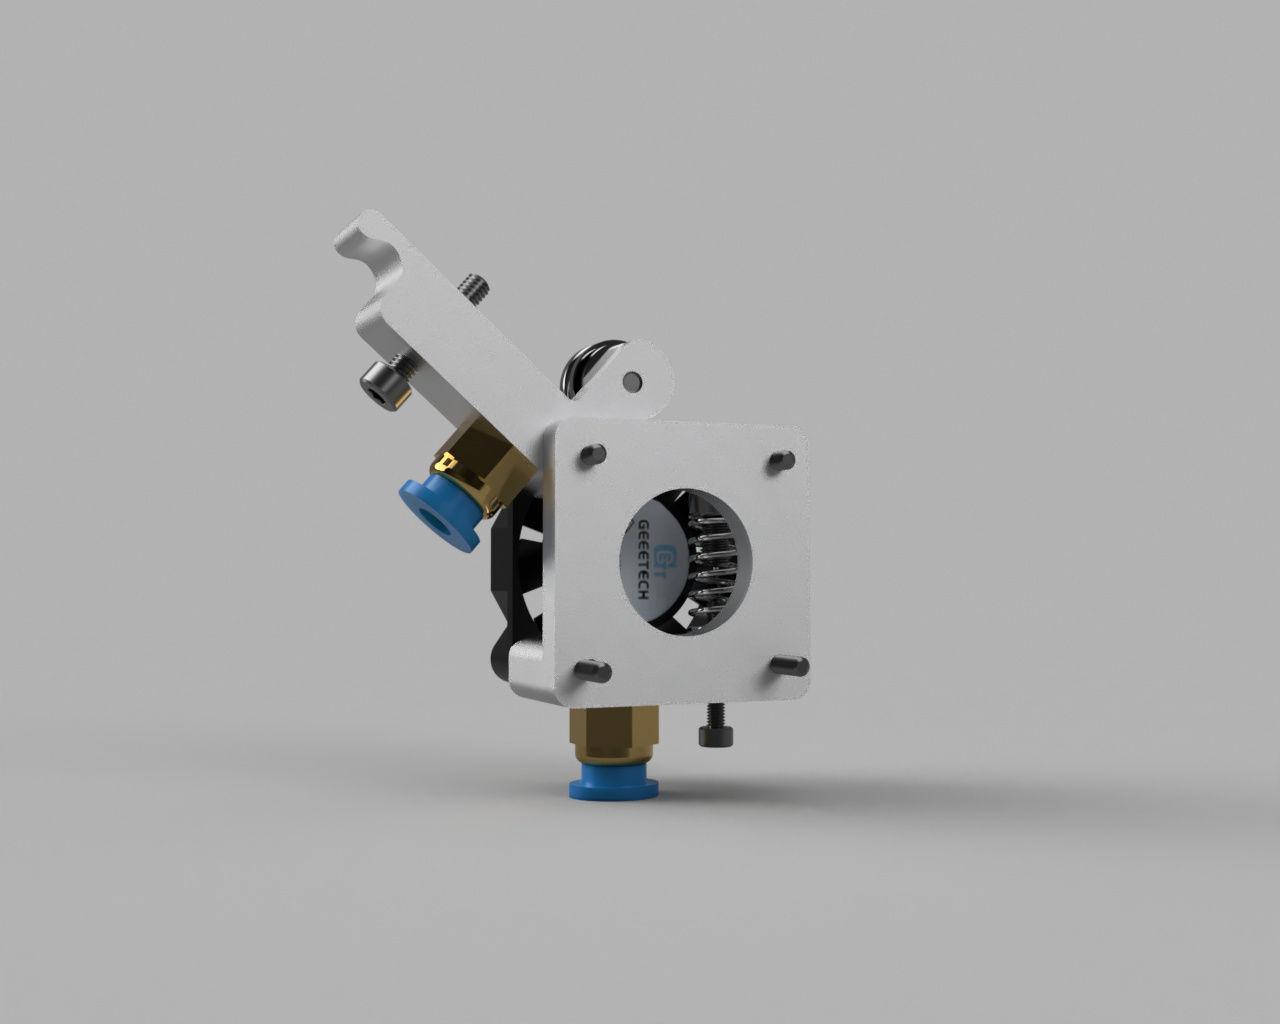 GEEETECH Bowden Extruder|Autodesk Online Gallery